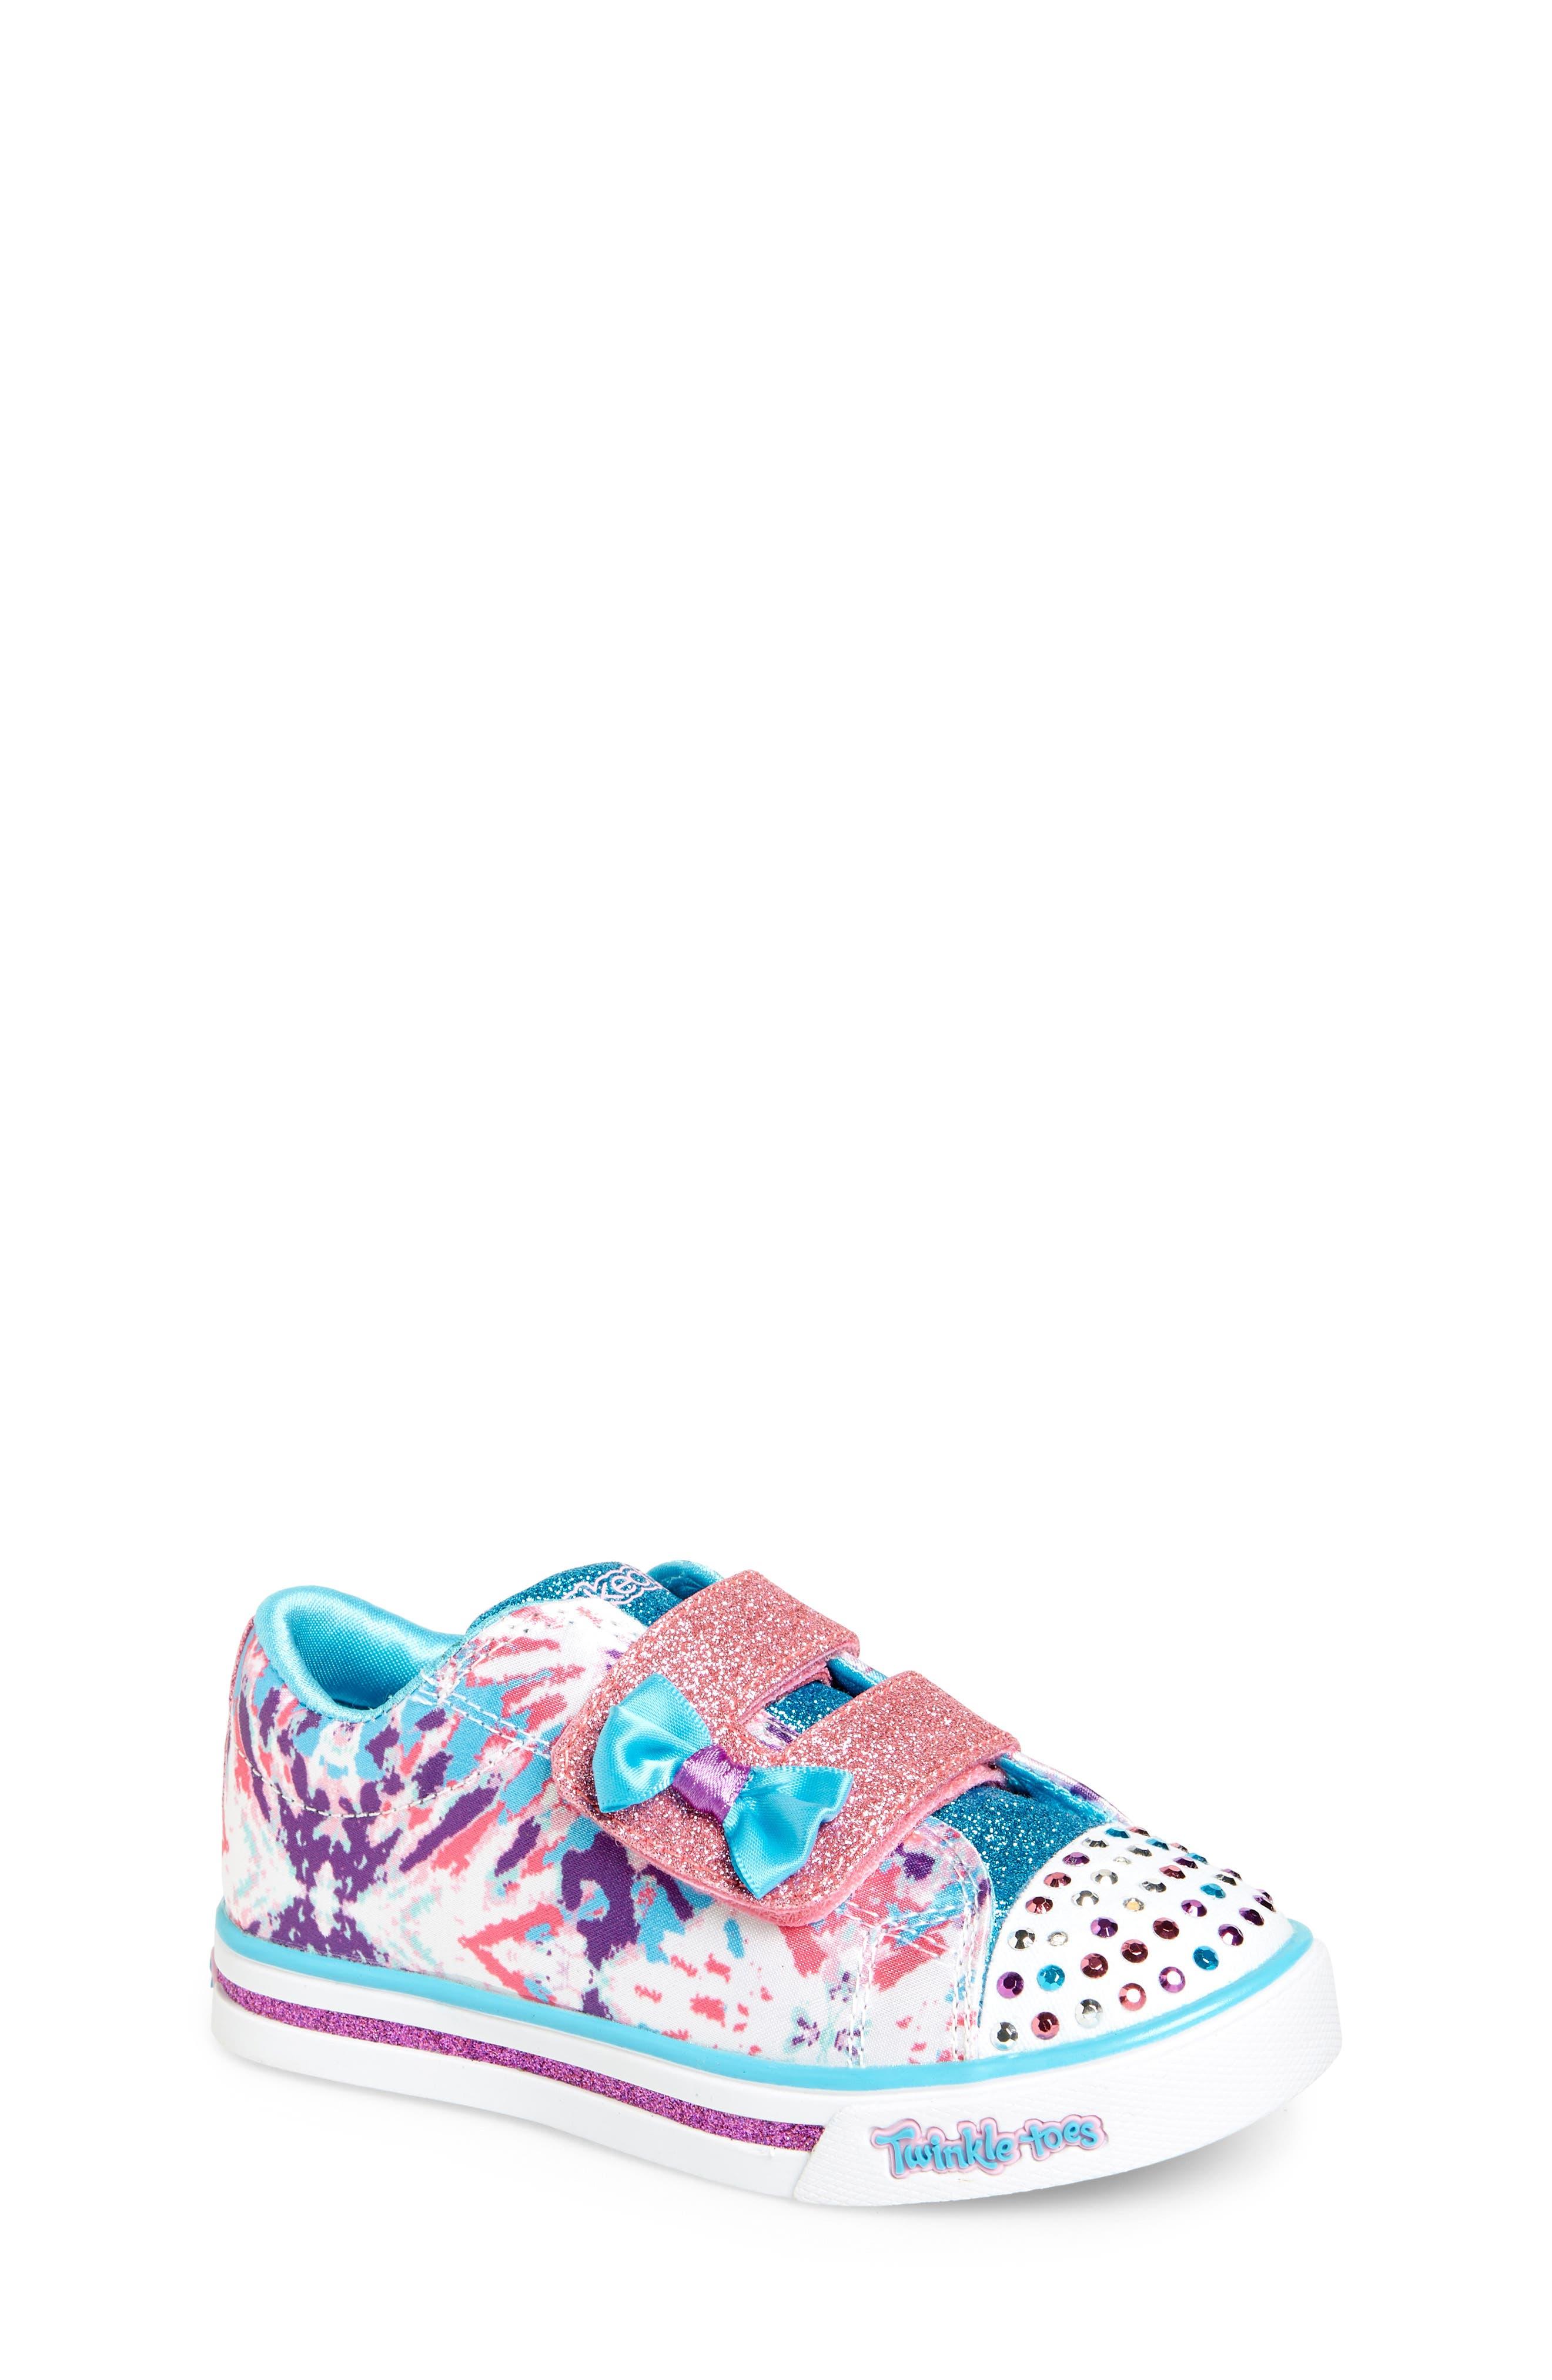 Sparkle Glitz Lil Dazzle Sneaker,                             Main thumbnail 1, color,                             199